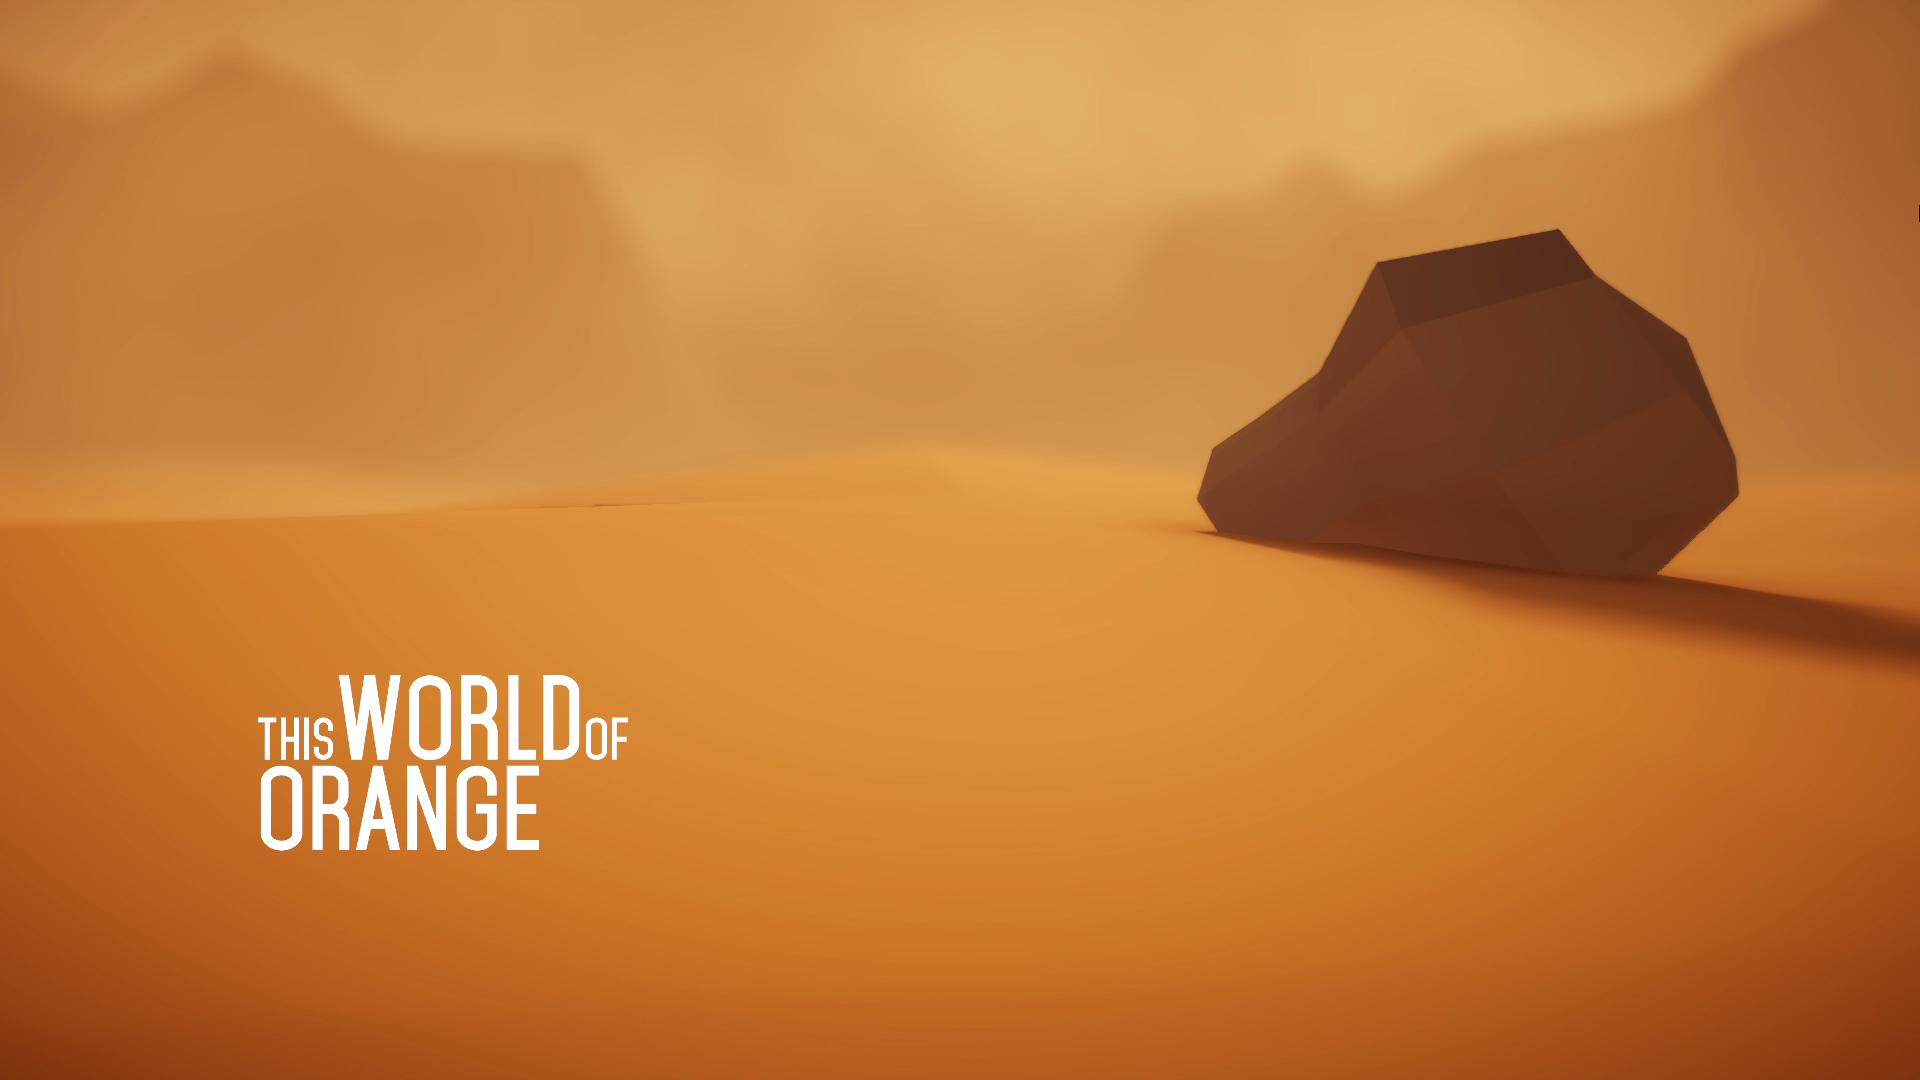 This World of Orange